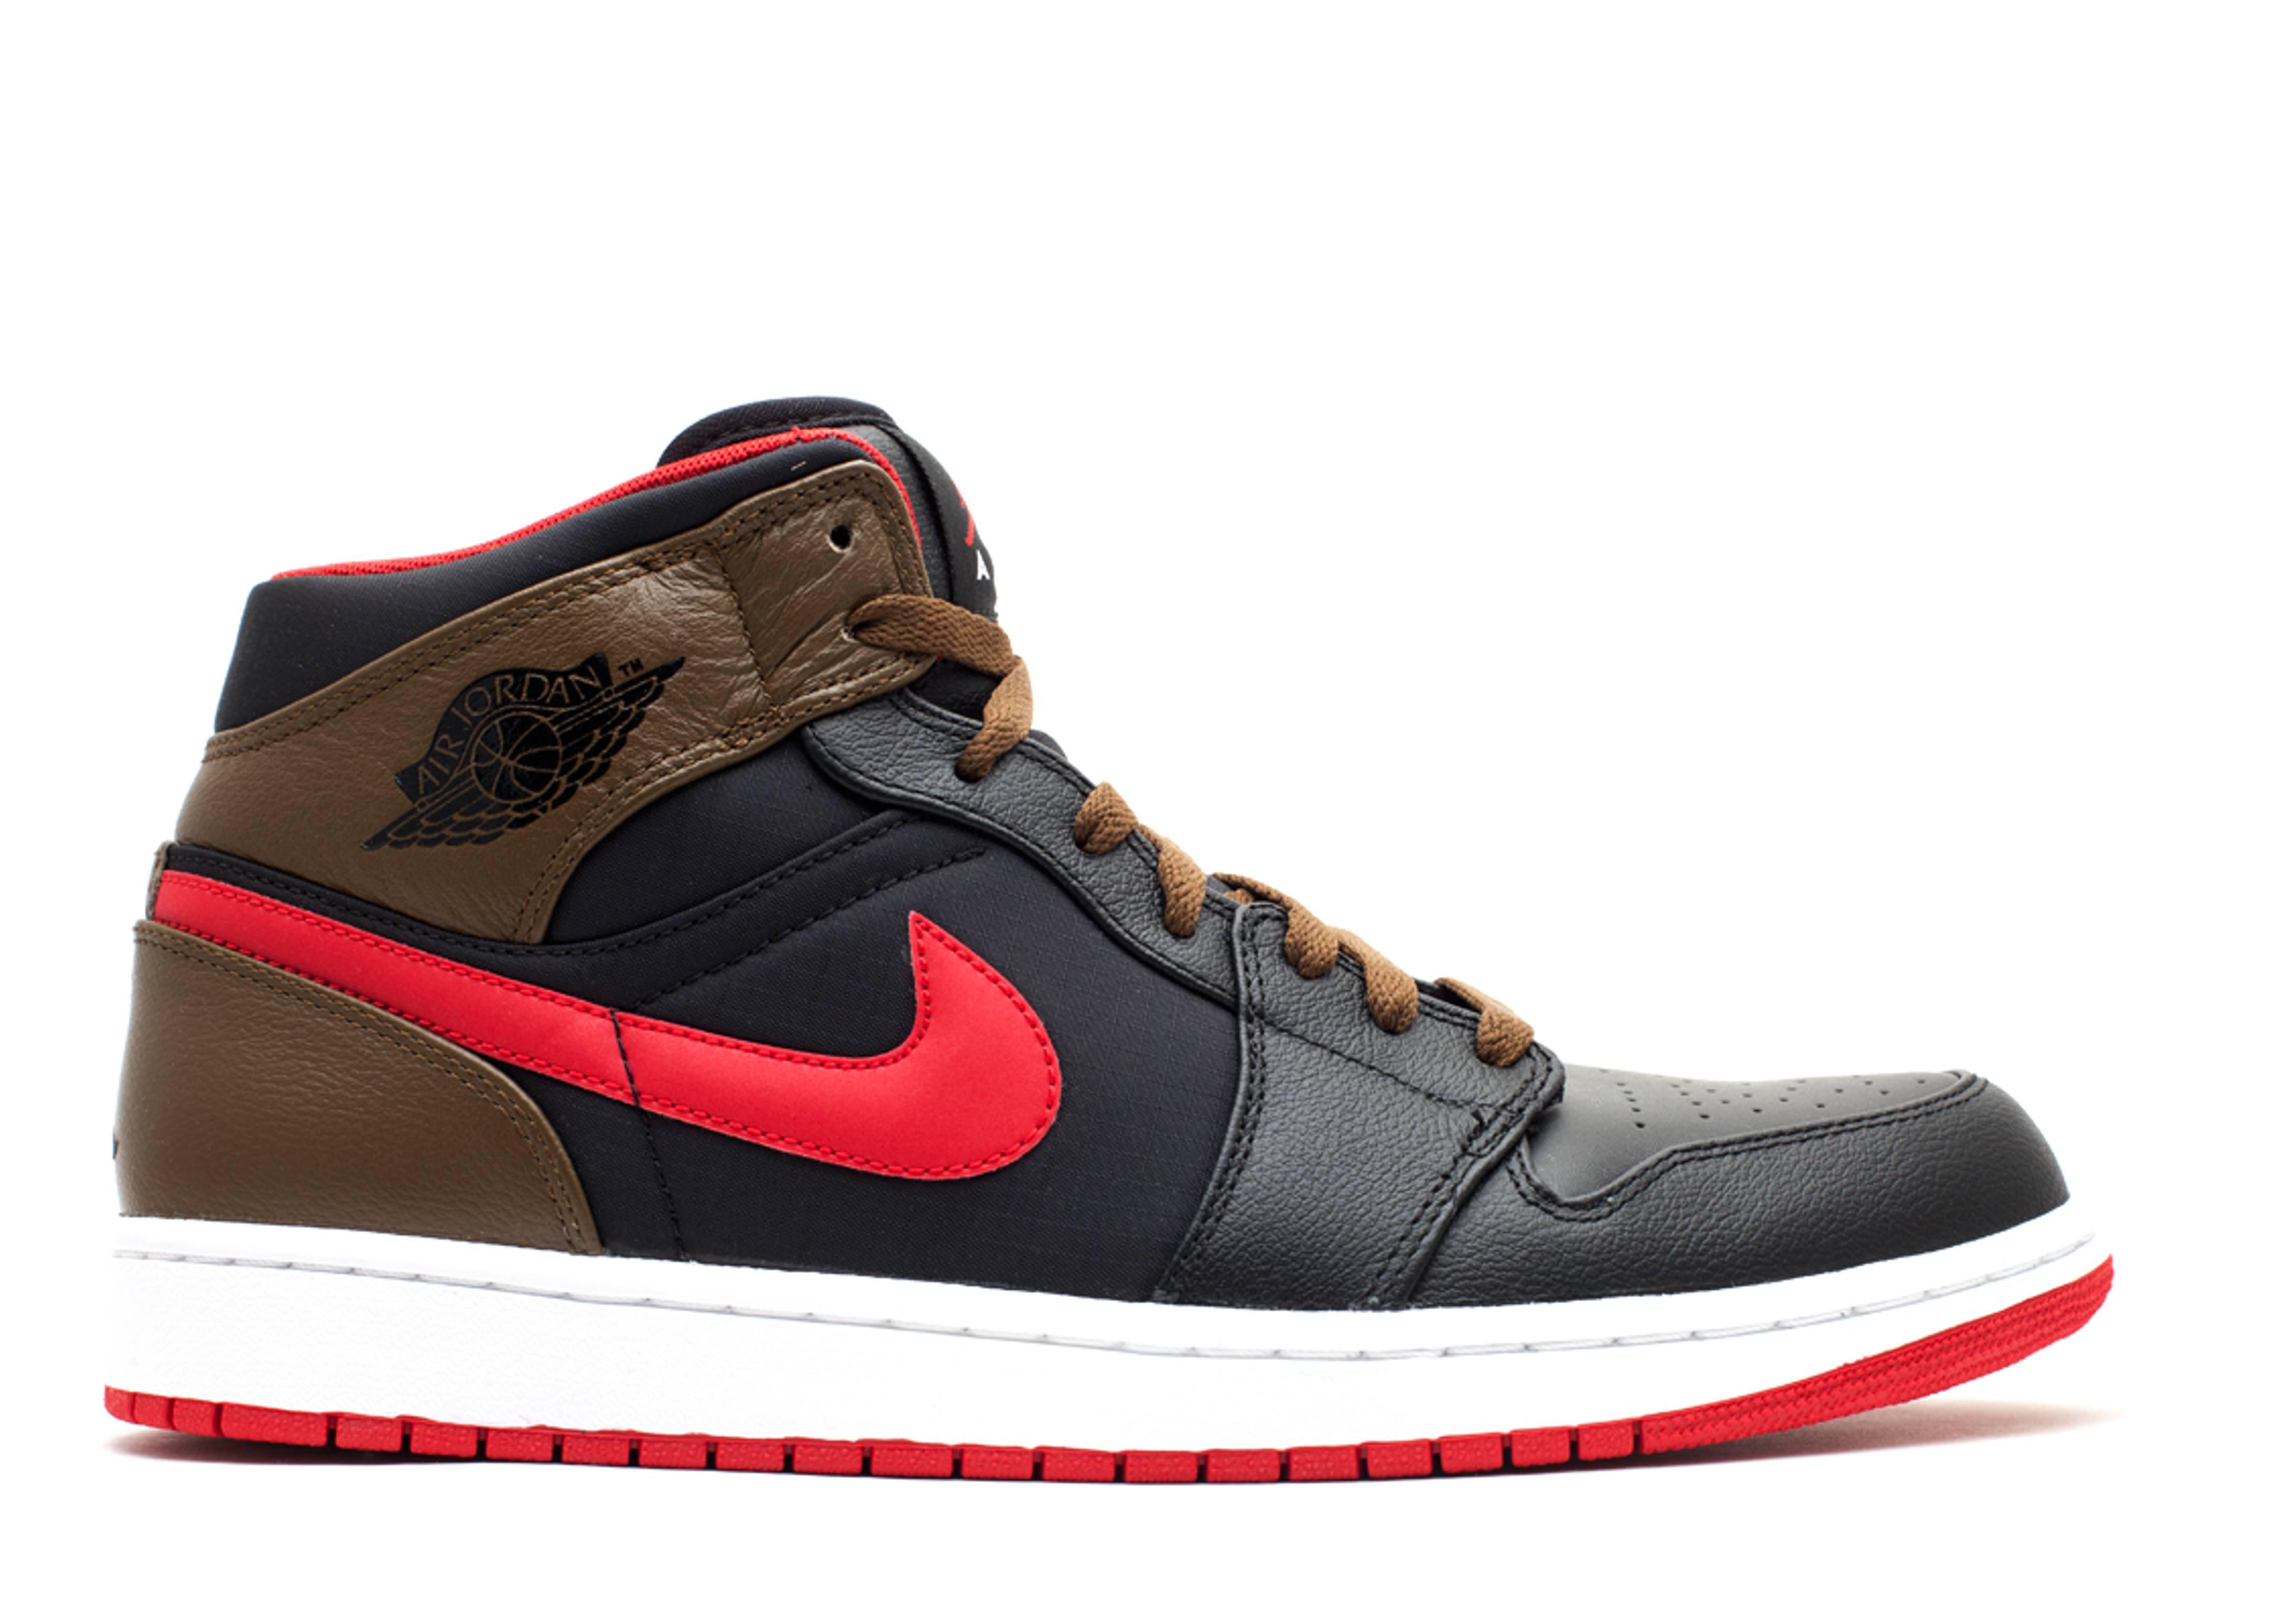 32504493342 Air Jordan 1 Phat - Air Jordan - 364770 040 - black gym red-lght olive-white